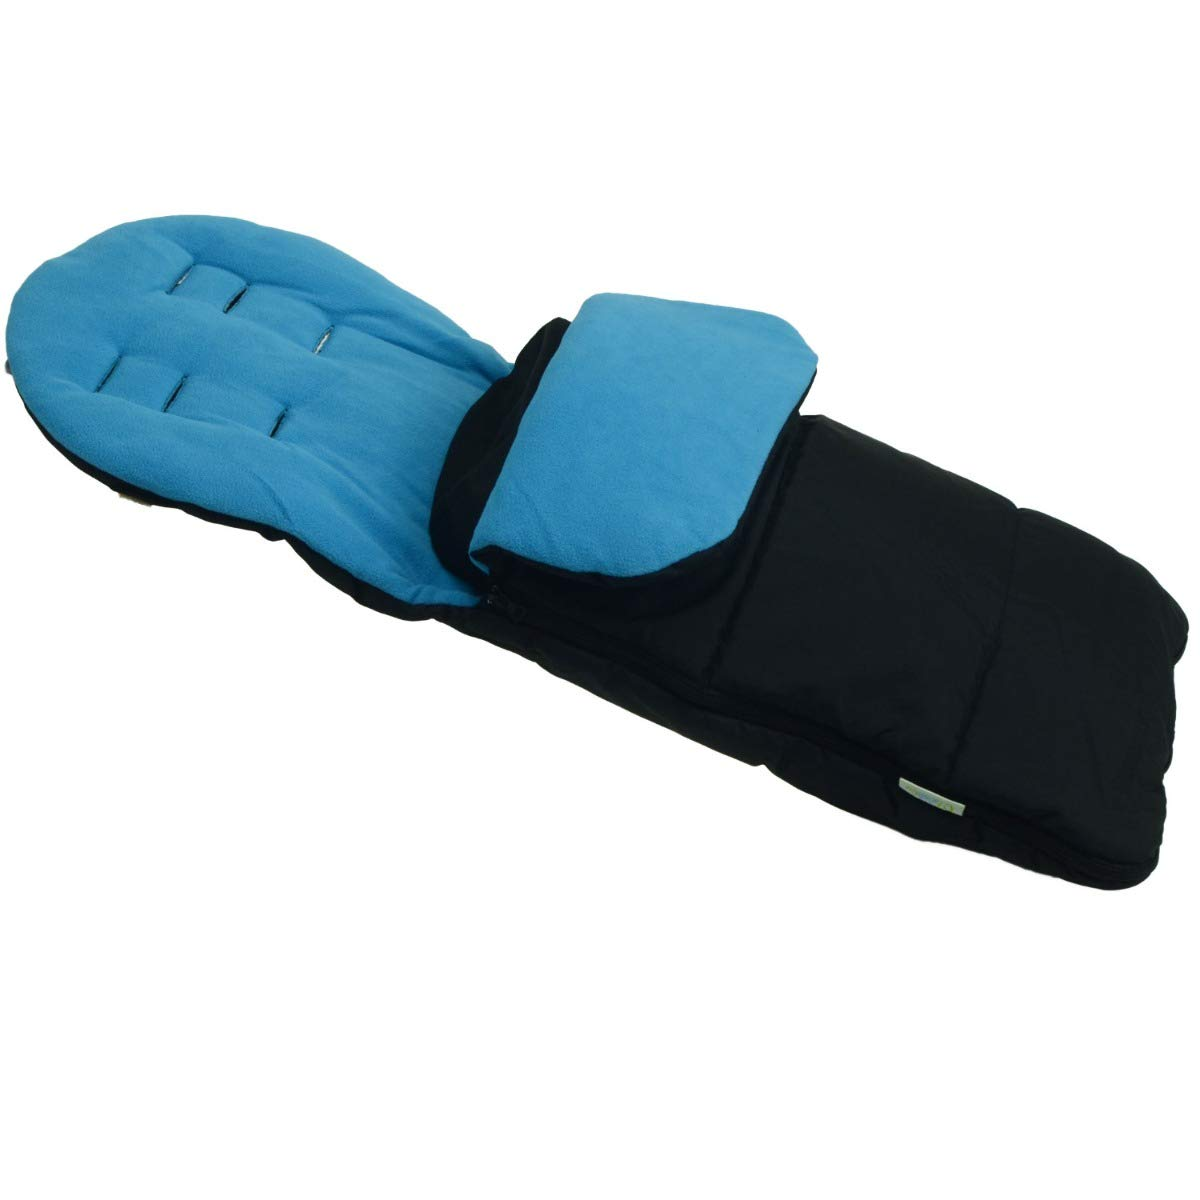 Black Jack Premium Footmuff//Cosy Toes Compatible with Silver Cross Wayfarer